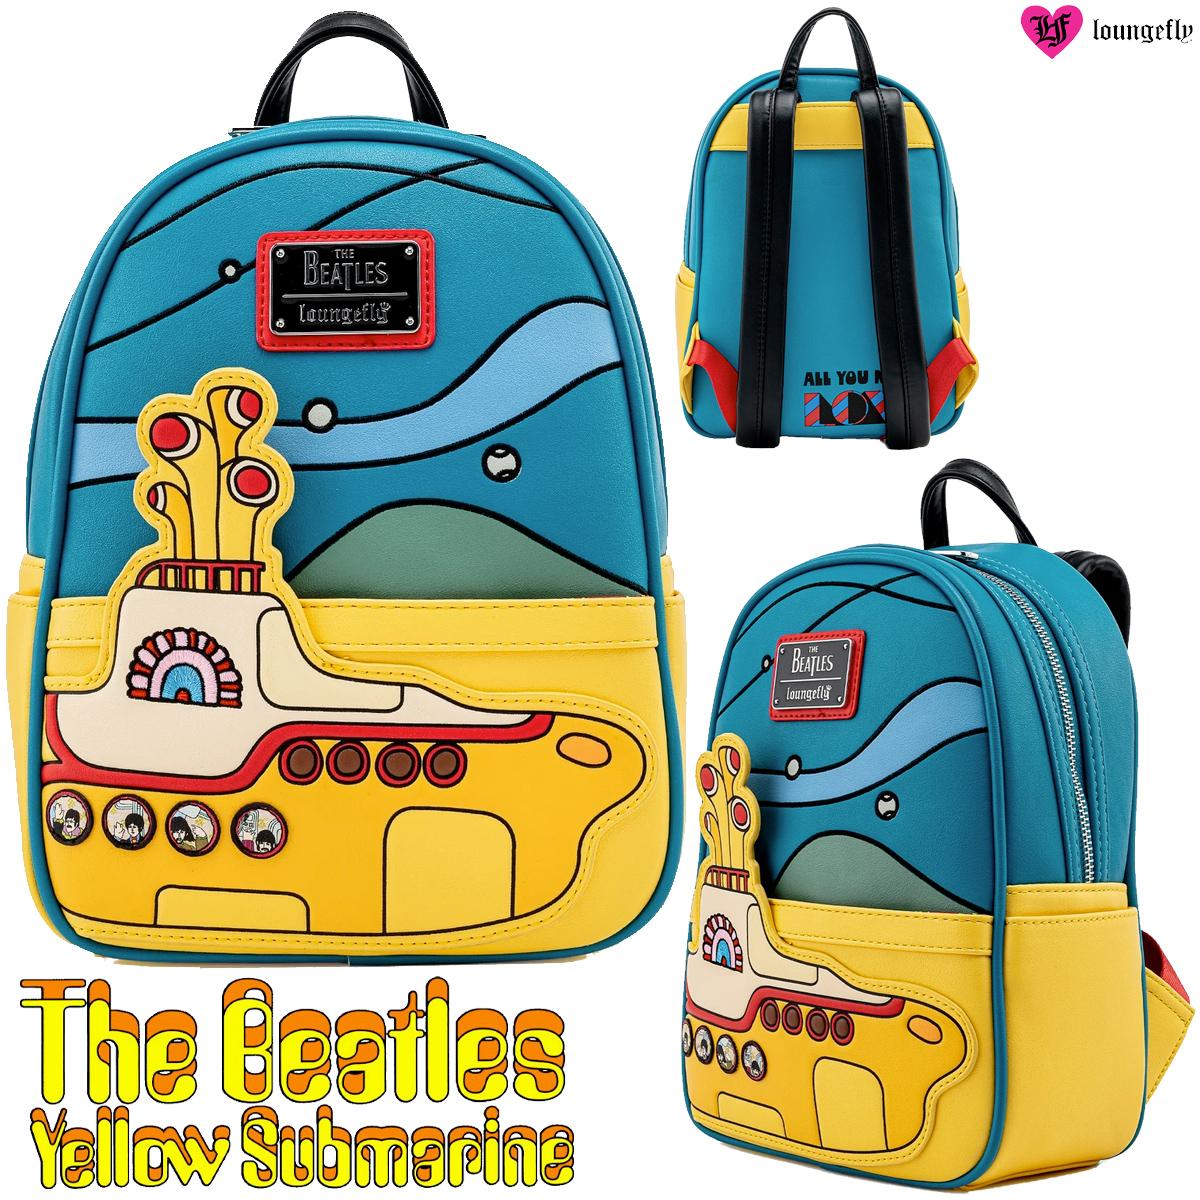 Mochila The Beatles Yellow Submarine Loungefly